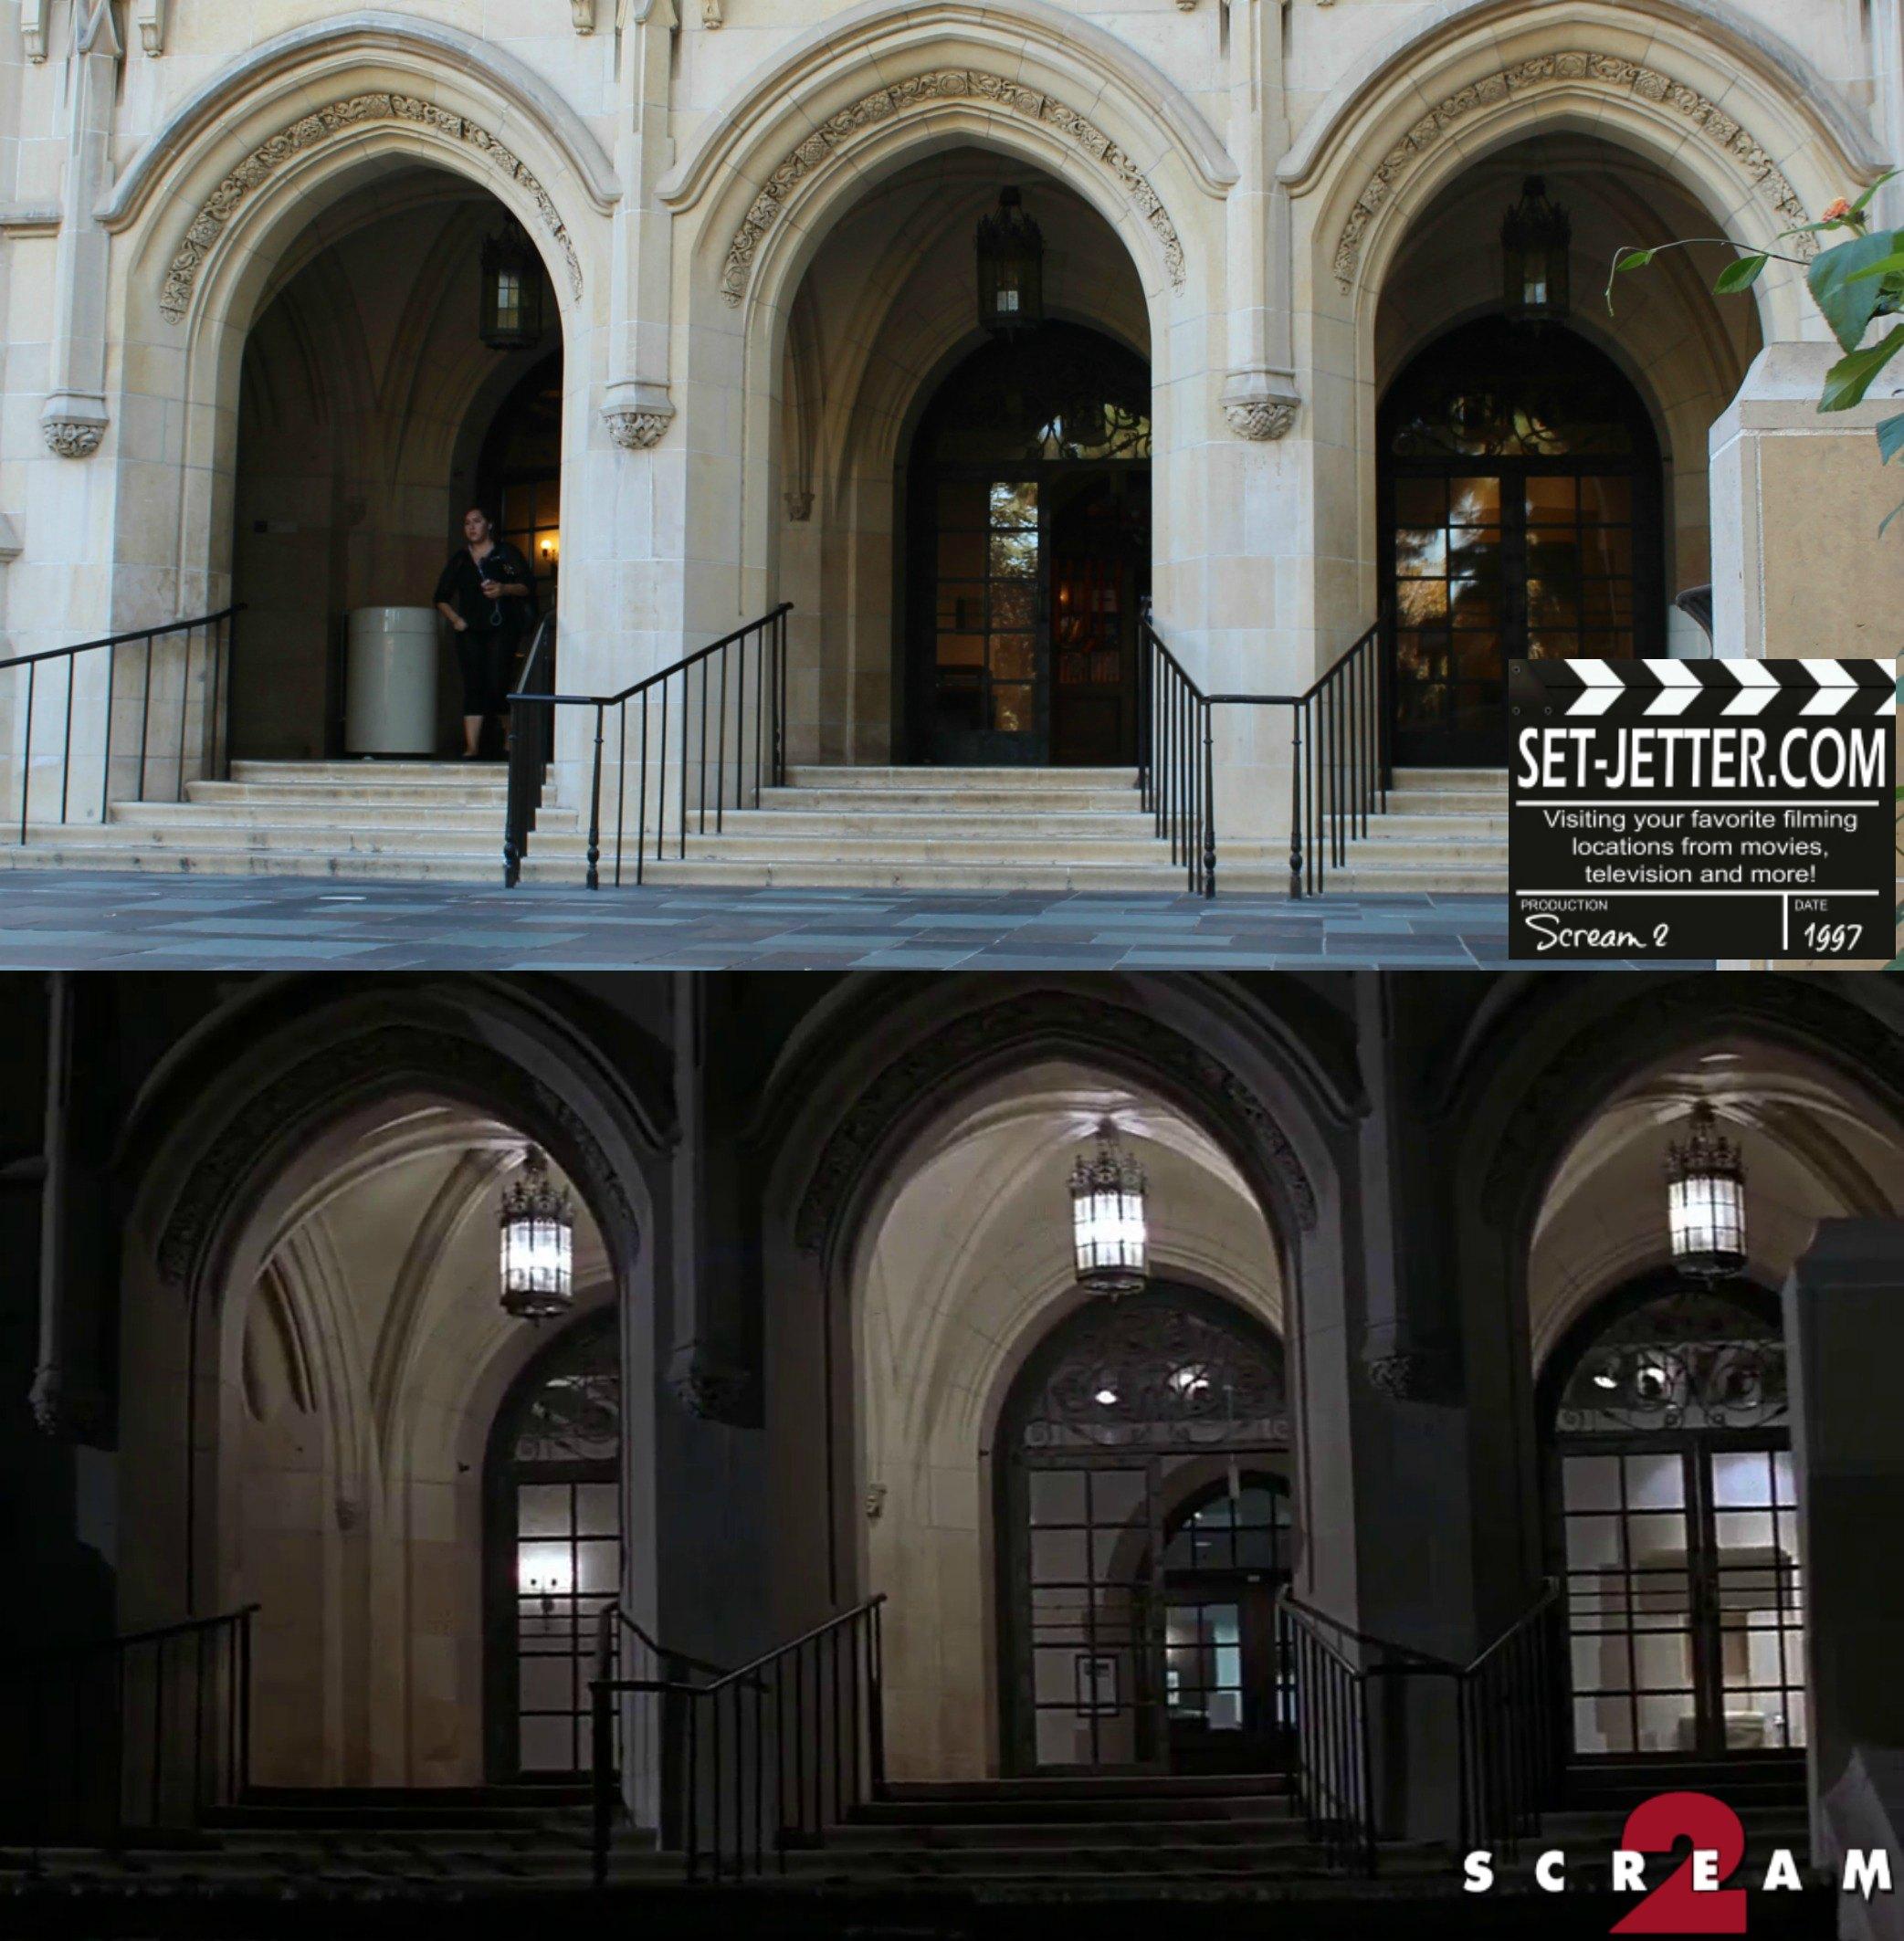 Scream 2 comparison 262.jpg